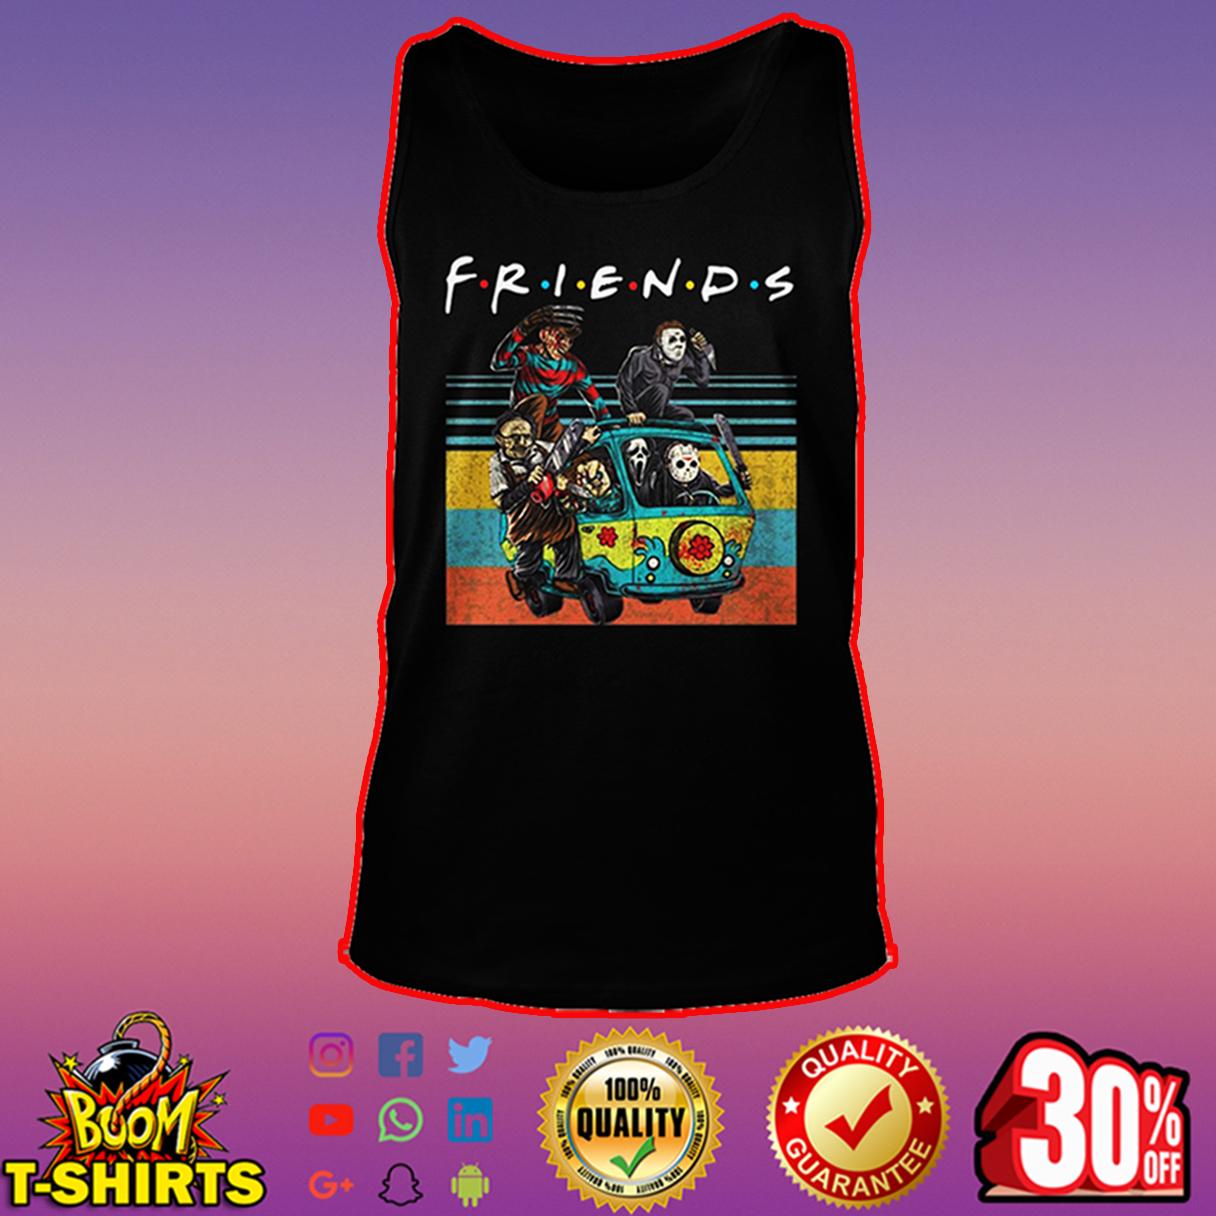 Freddy Krueger Michael Myers Leatherface Chucky Ghostface Jason Voorhees friends tank top